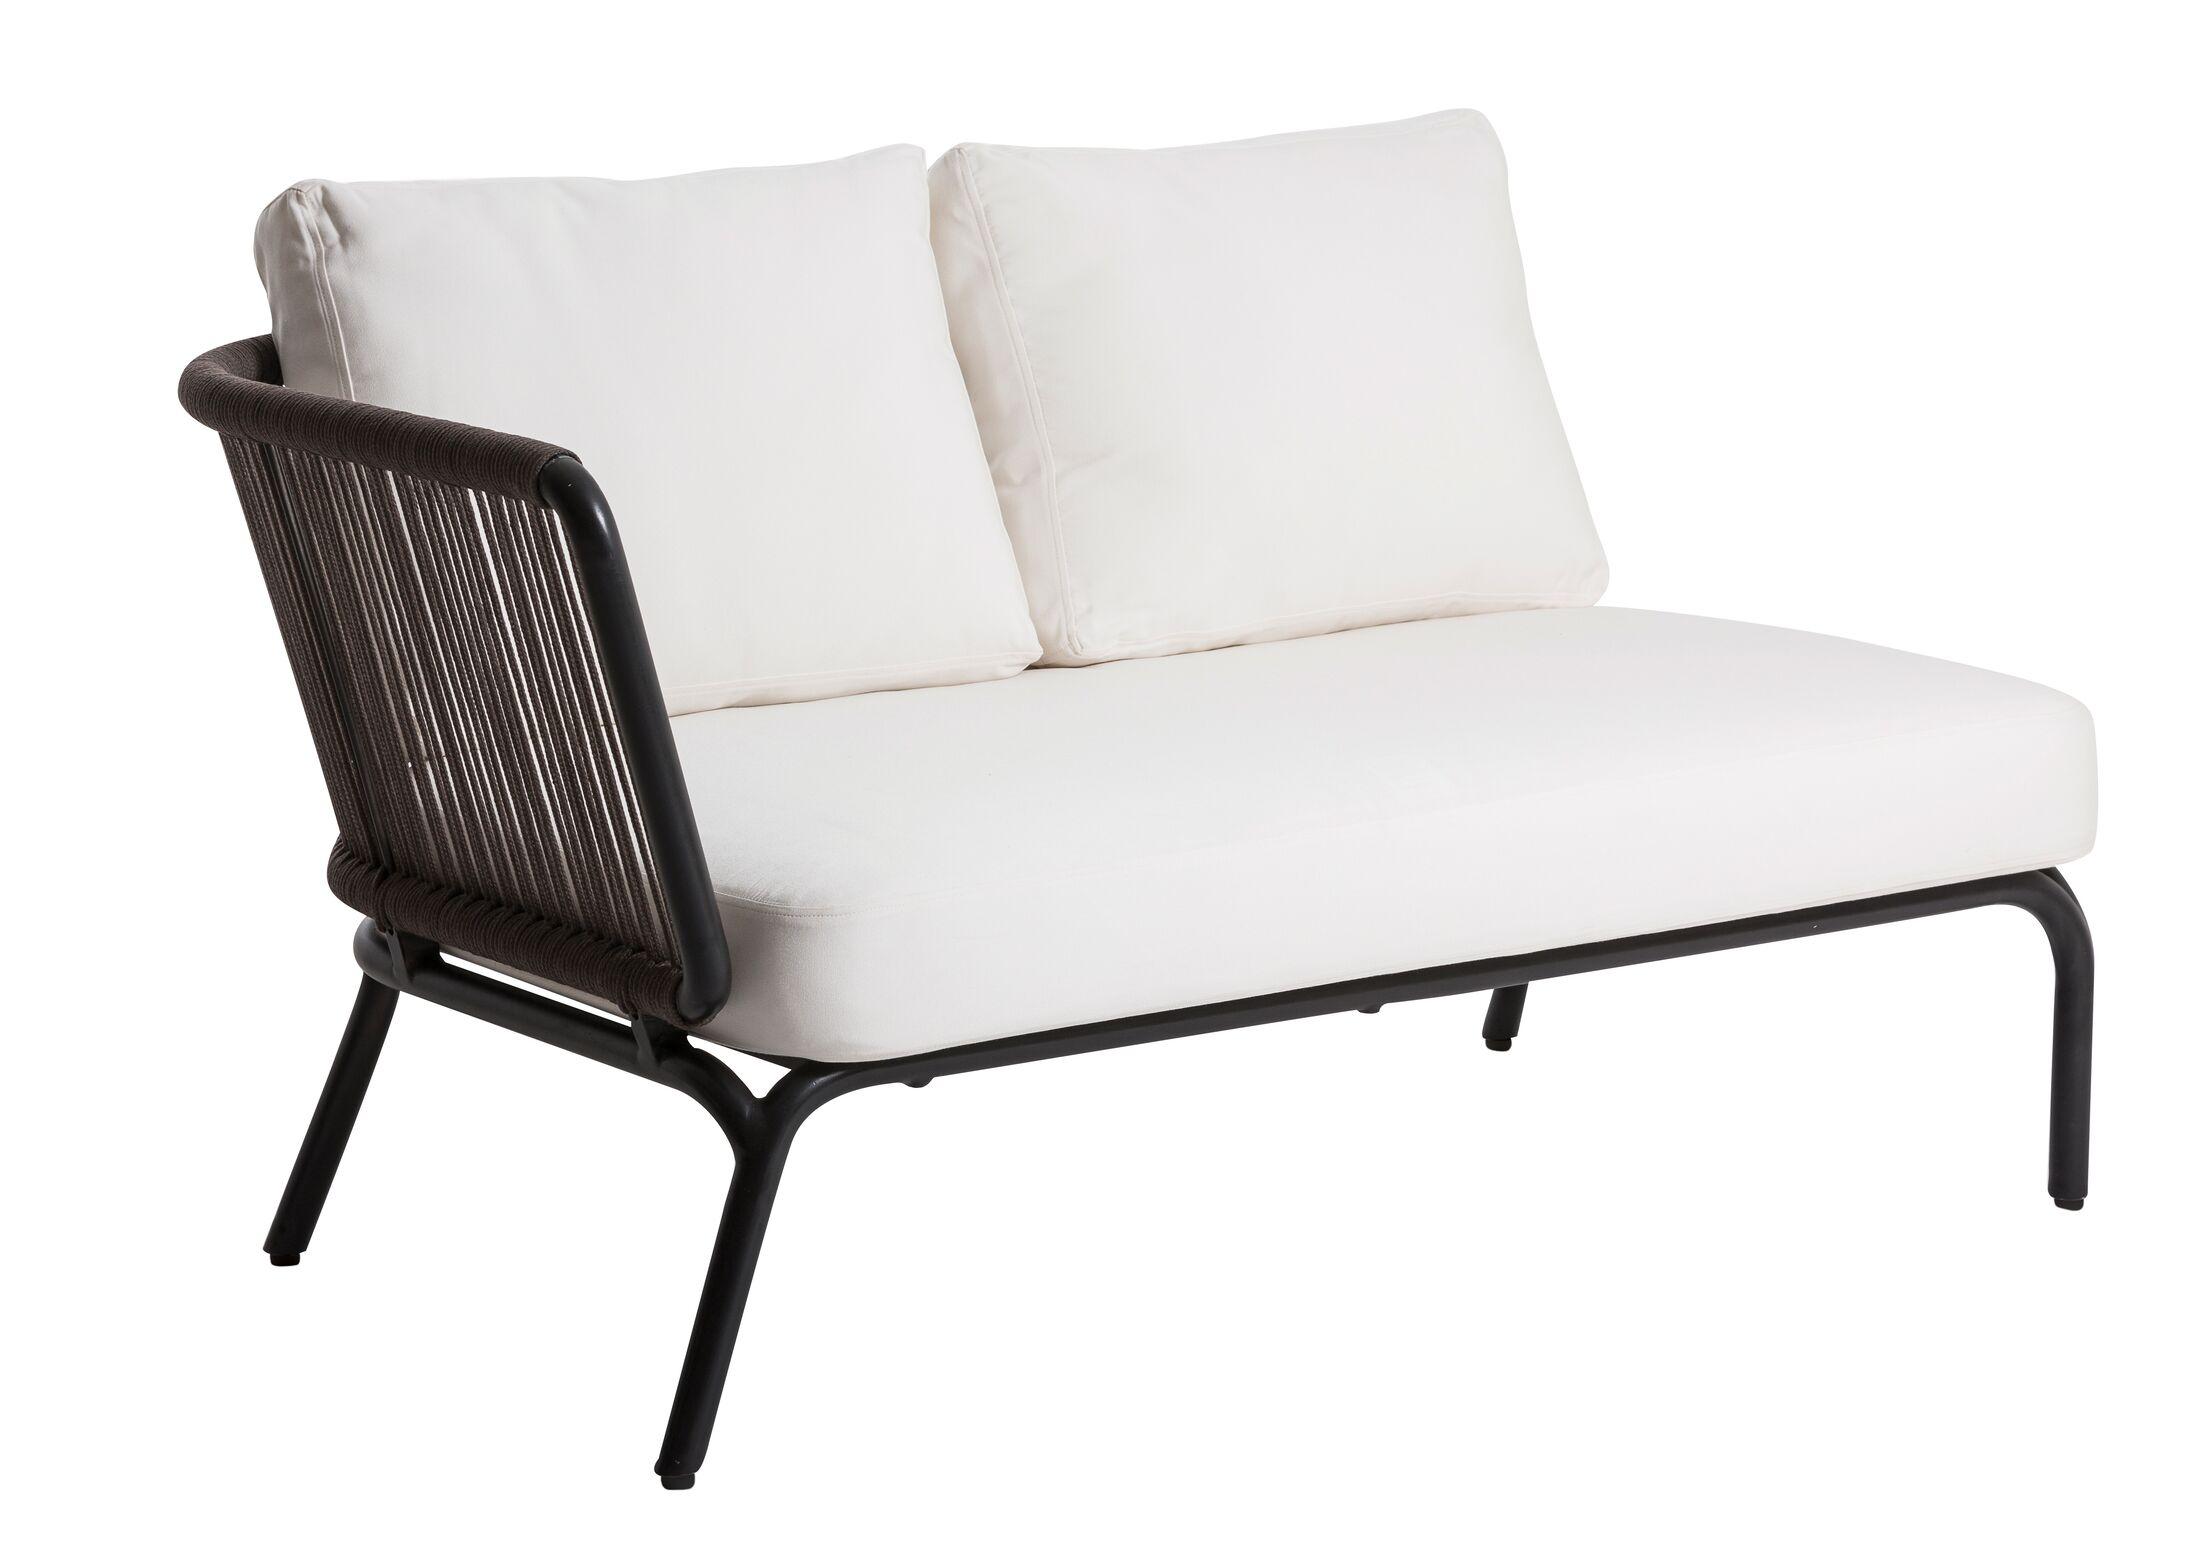 Yland Patio Sofa with Cushions Finish: Taupe / Anthracite, Fabric: Lanten Slate